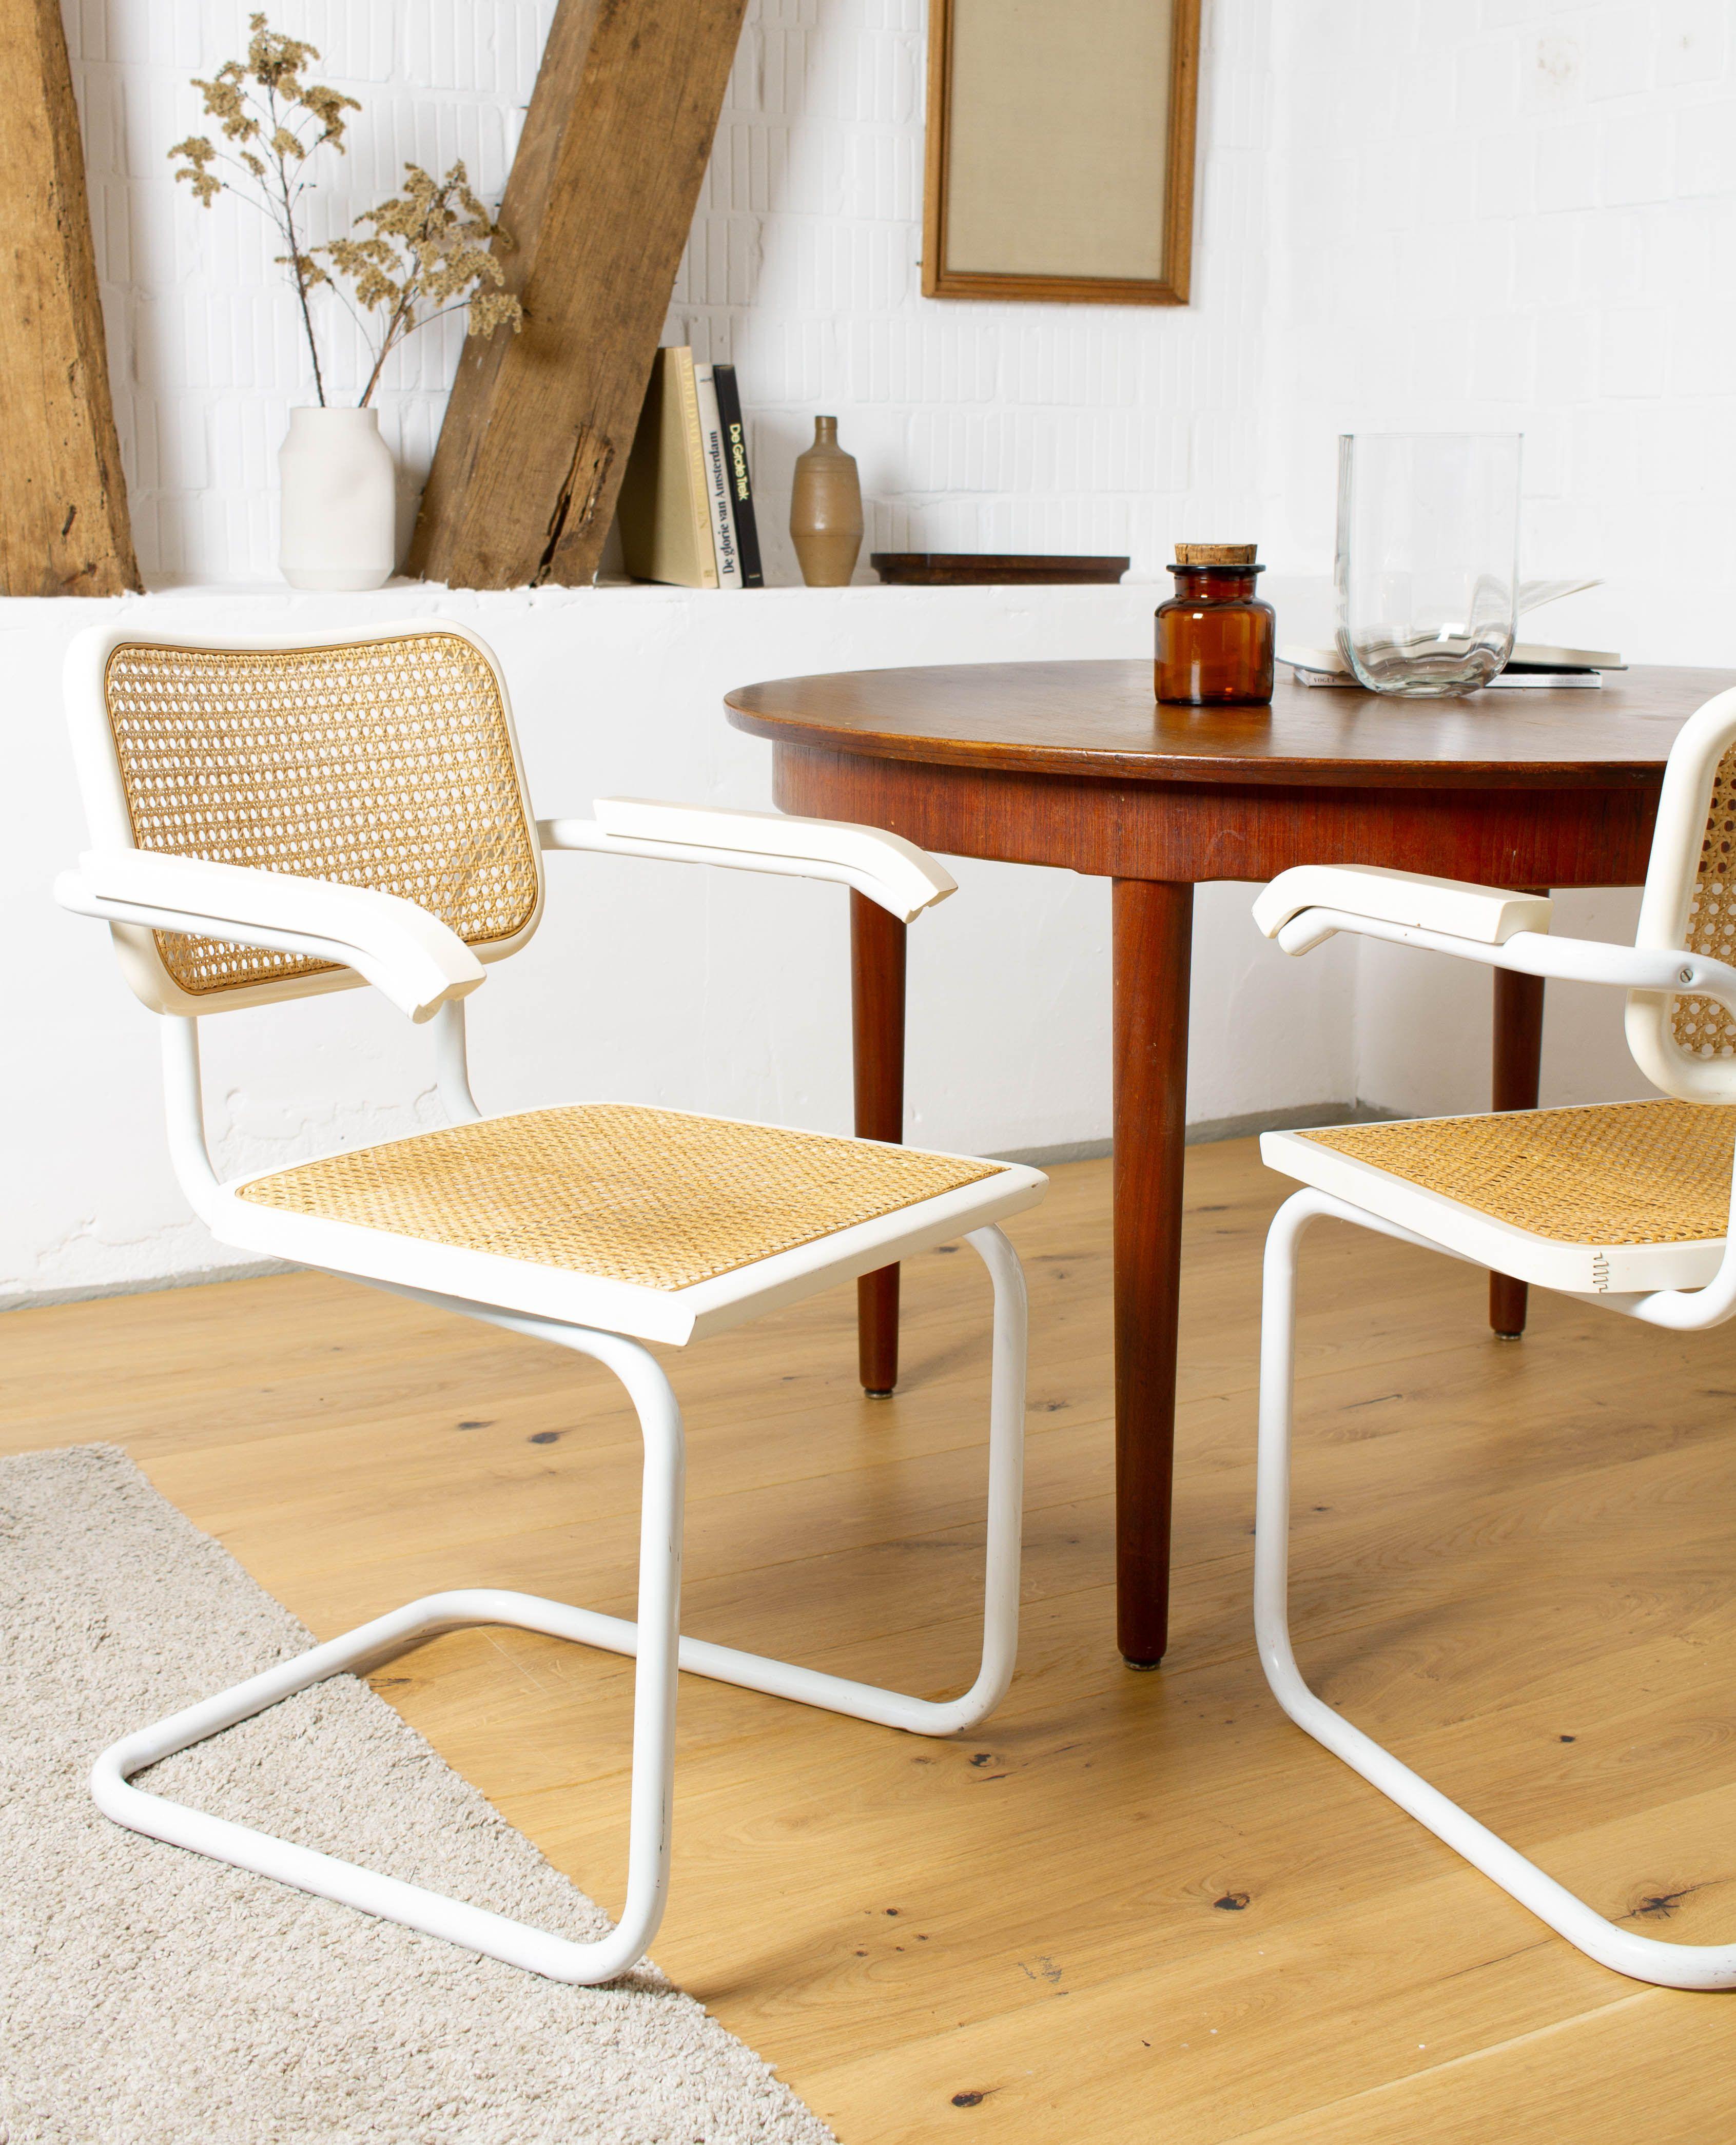 Freischwinger Stuhl Weiss Breuer Thonet Stil S 64 Armlehnen Etsy Cantilever Chair Cesca Chair Chair